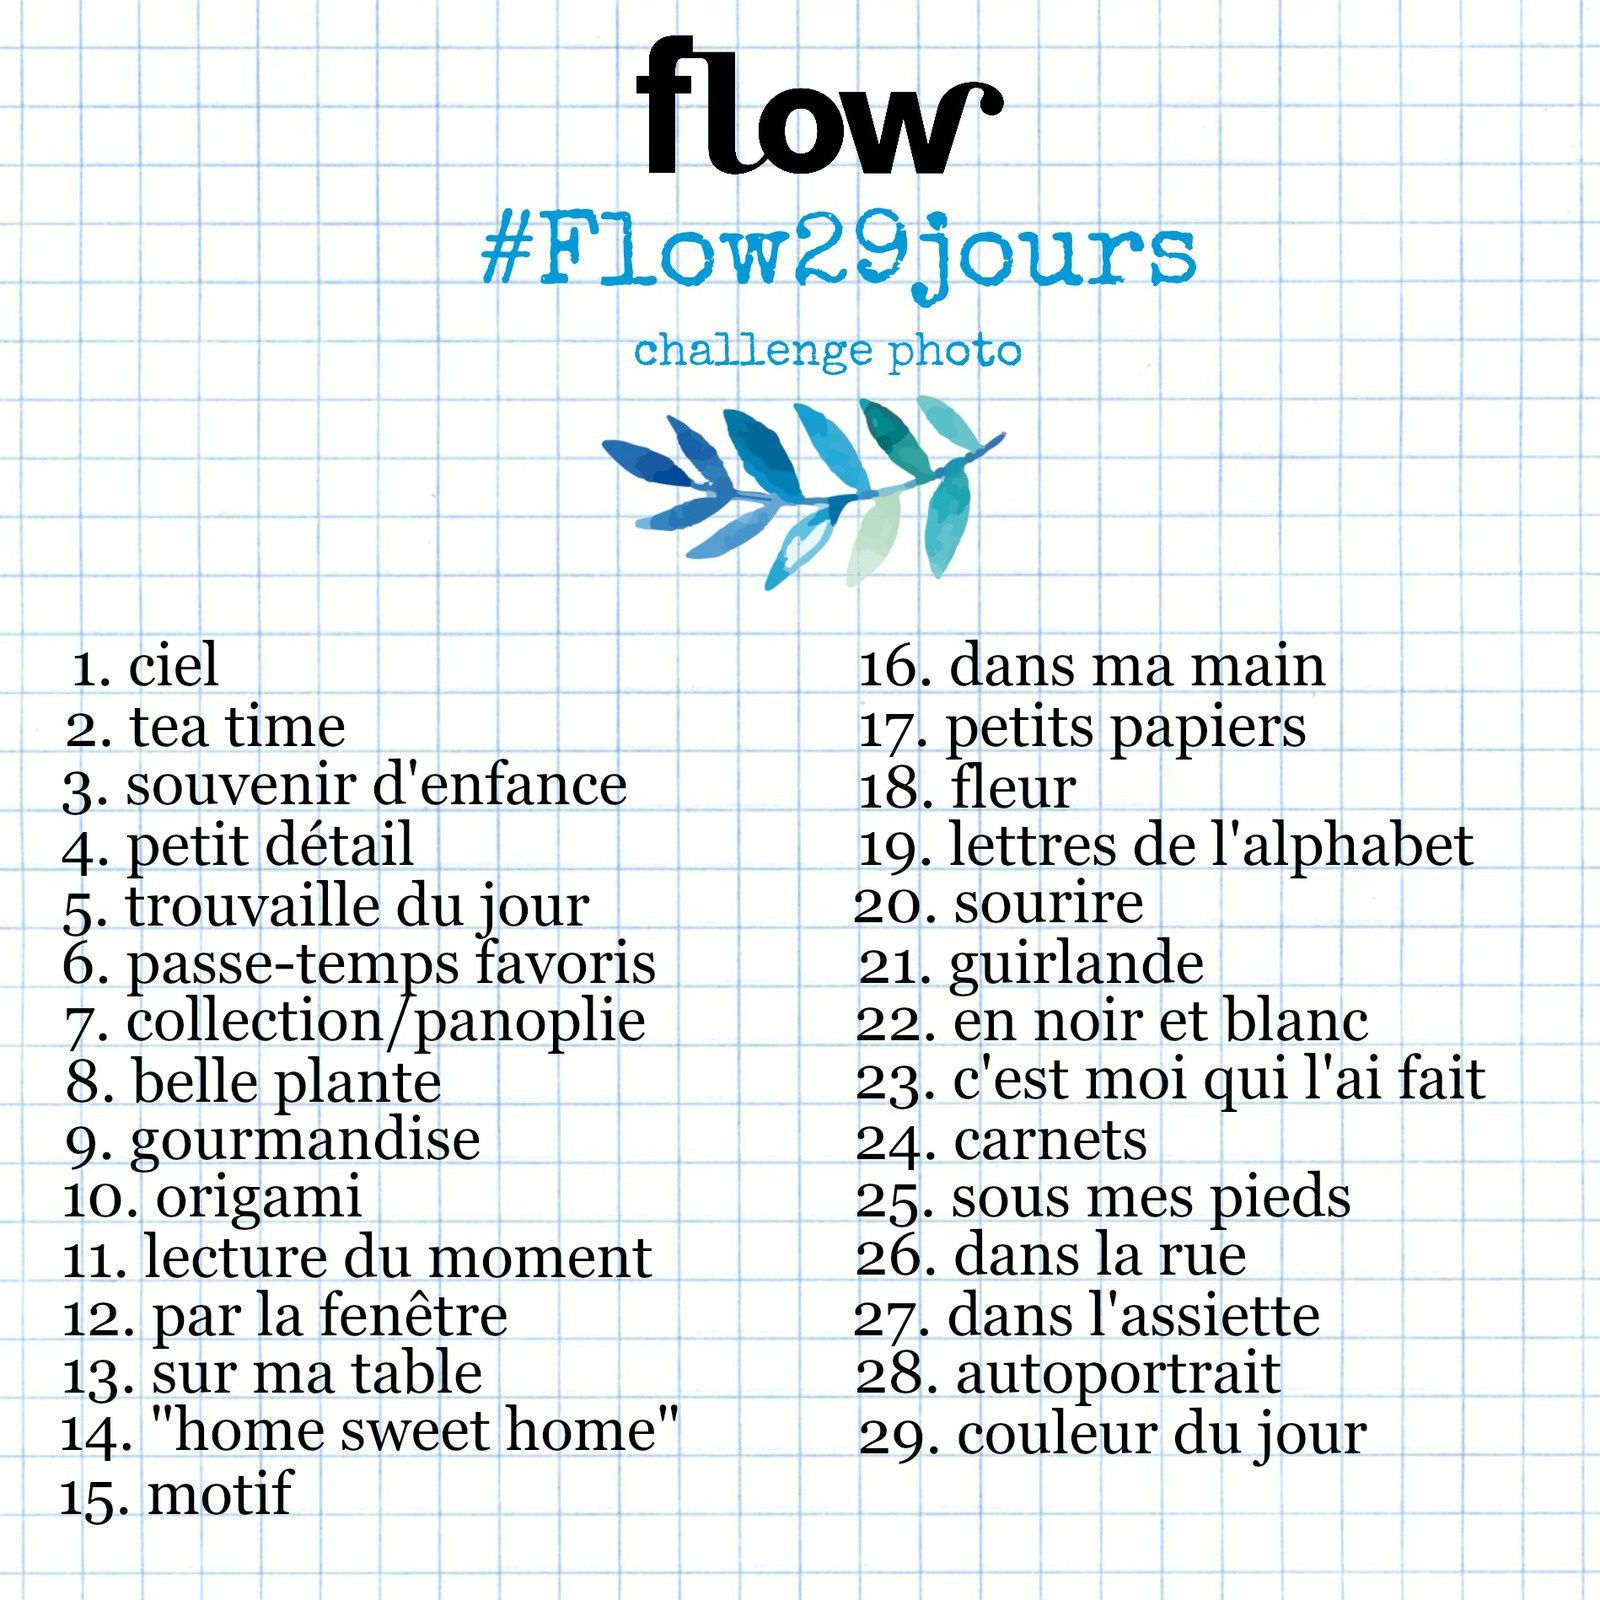 #Flow29jours 26.dans la rue